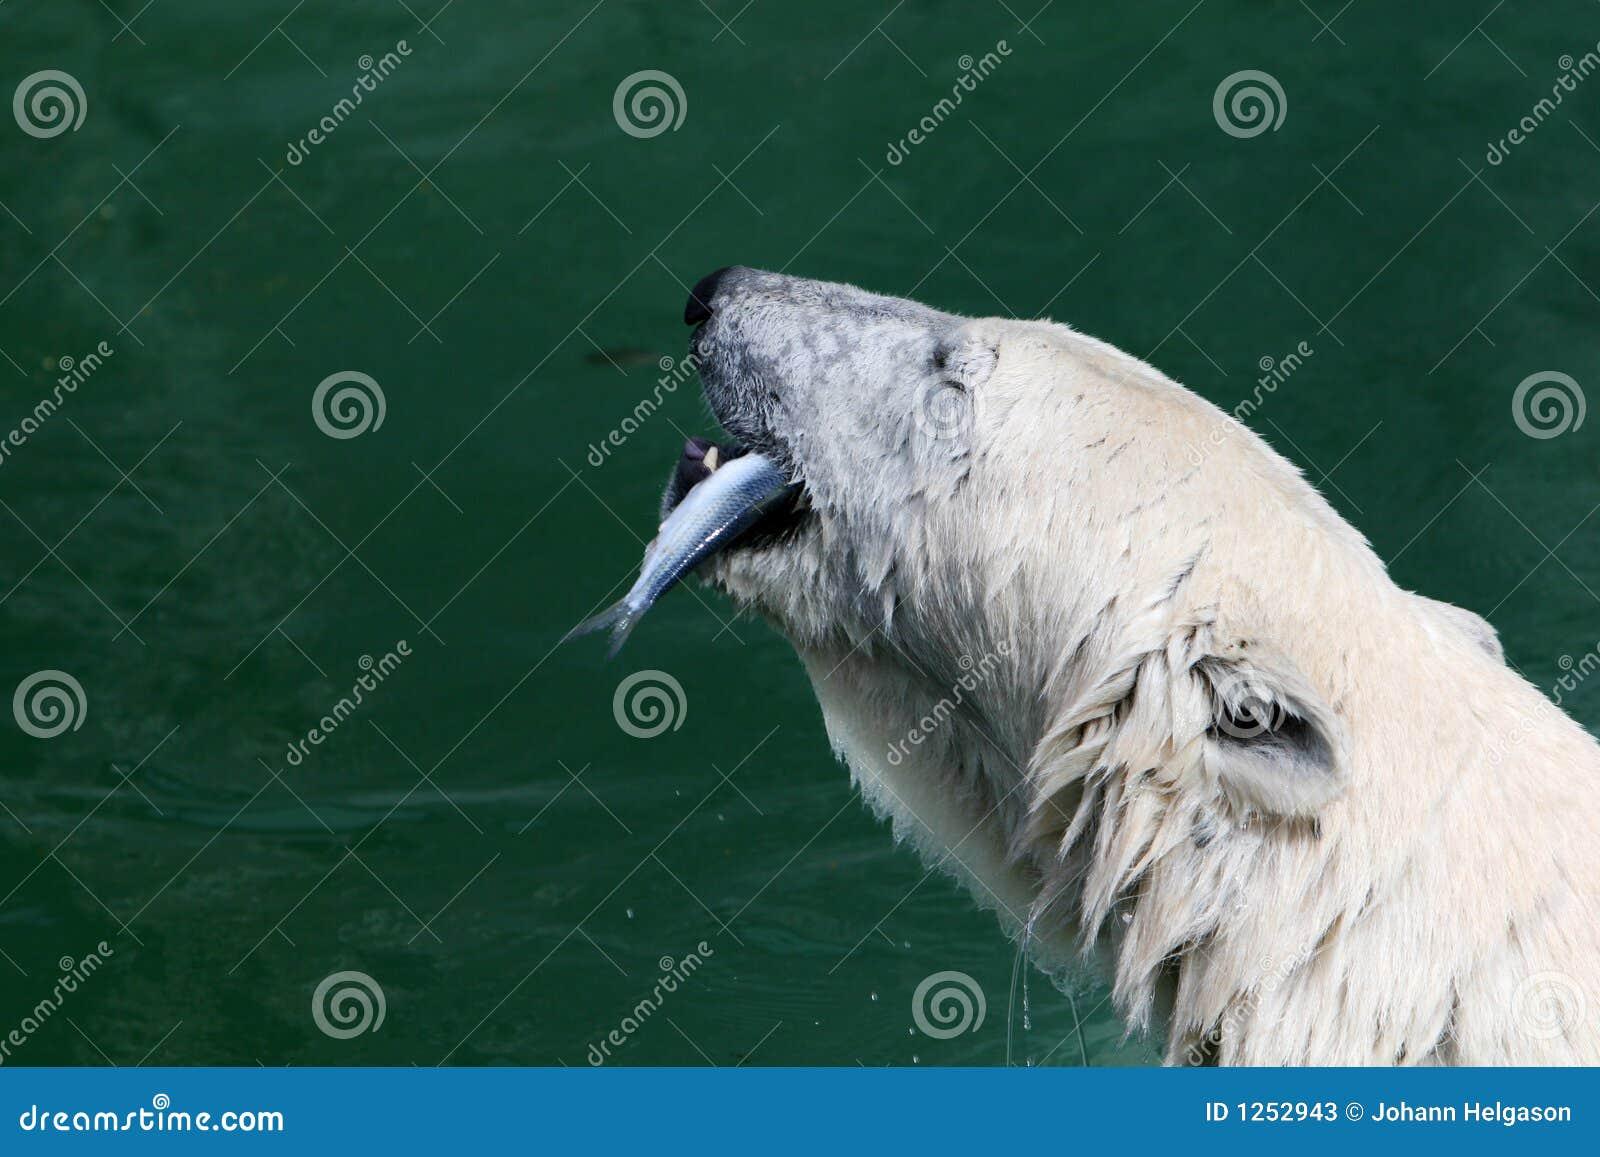 Papa bear stock photos image 1252943 for Dreaming of eating fish